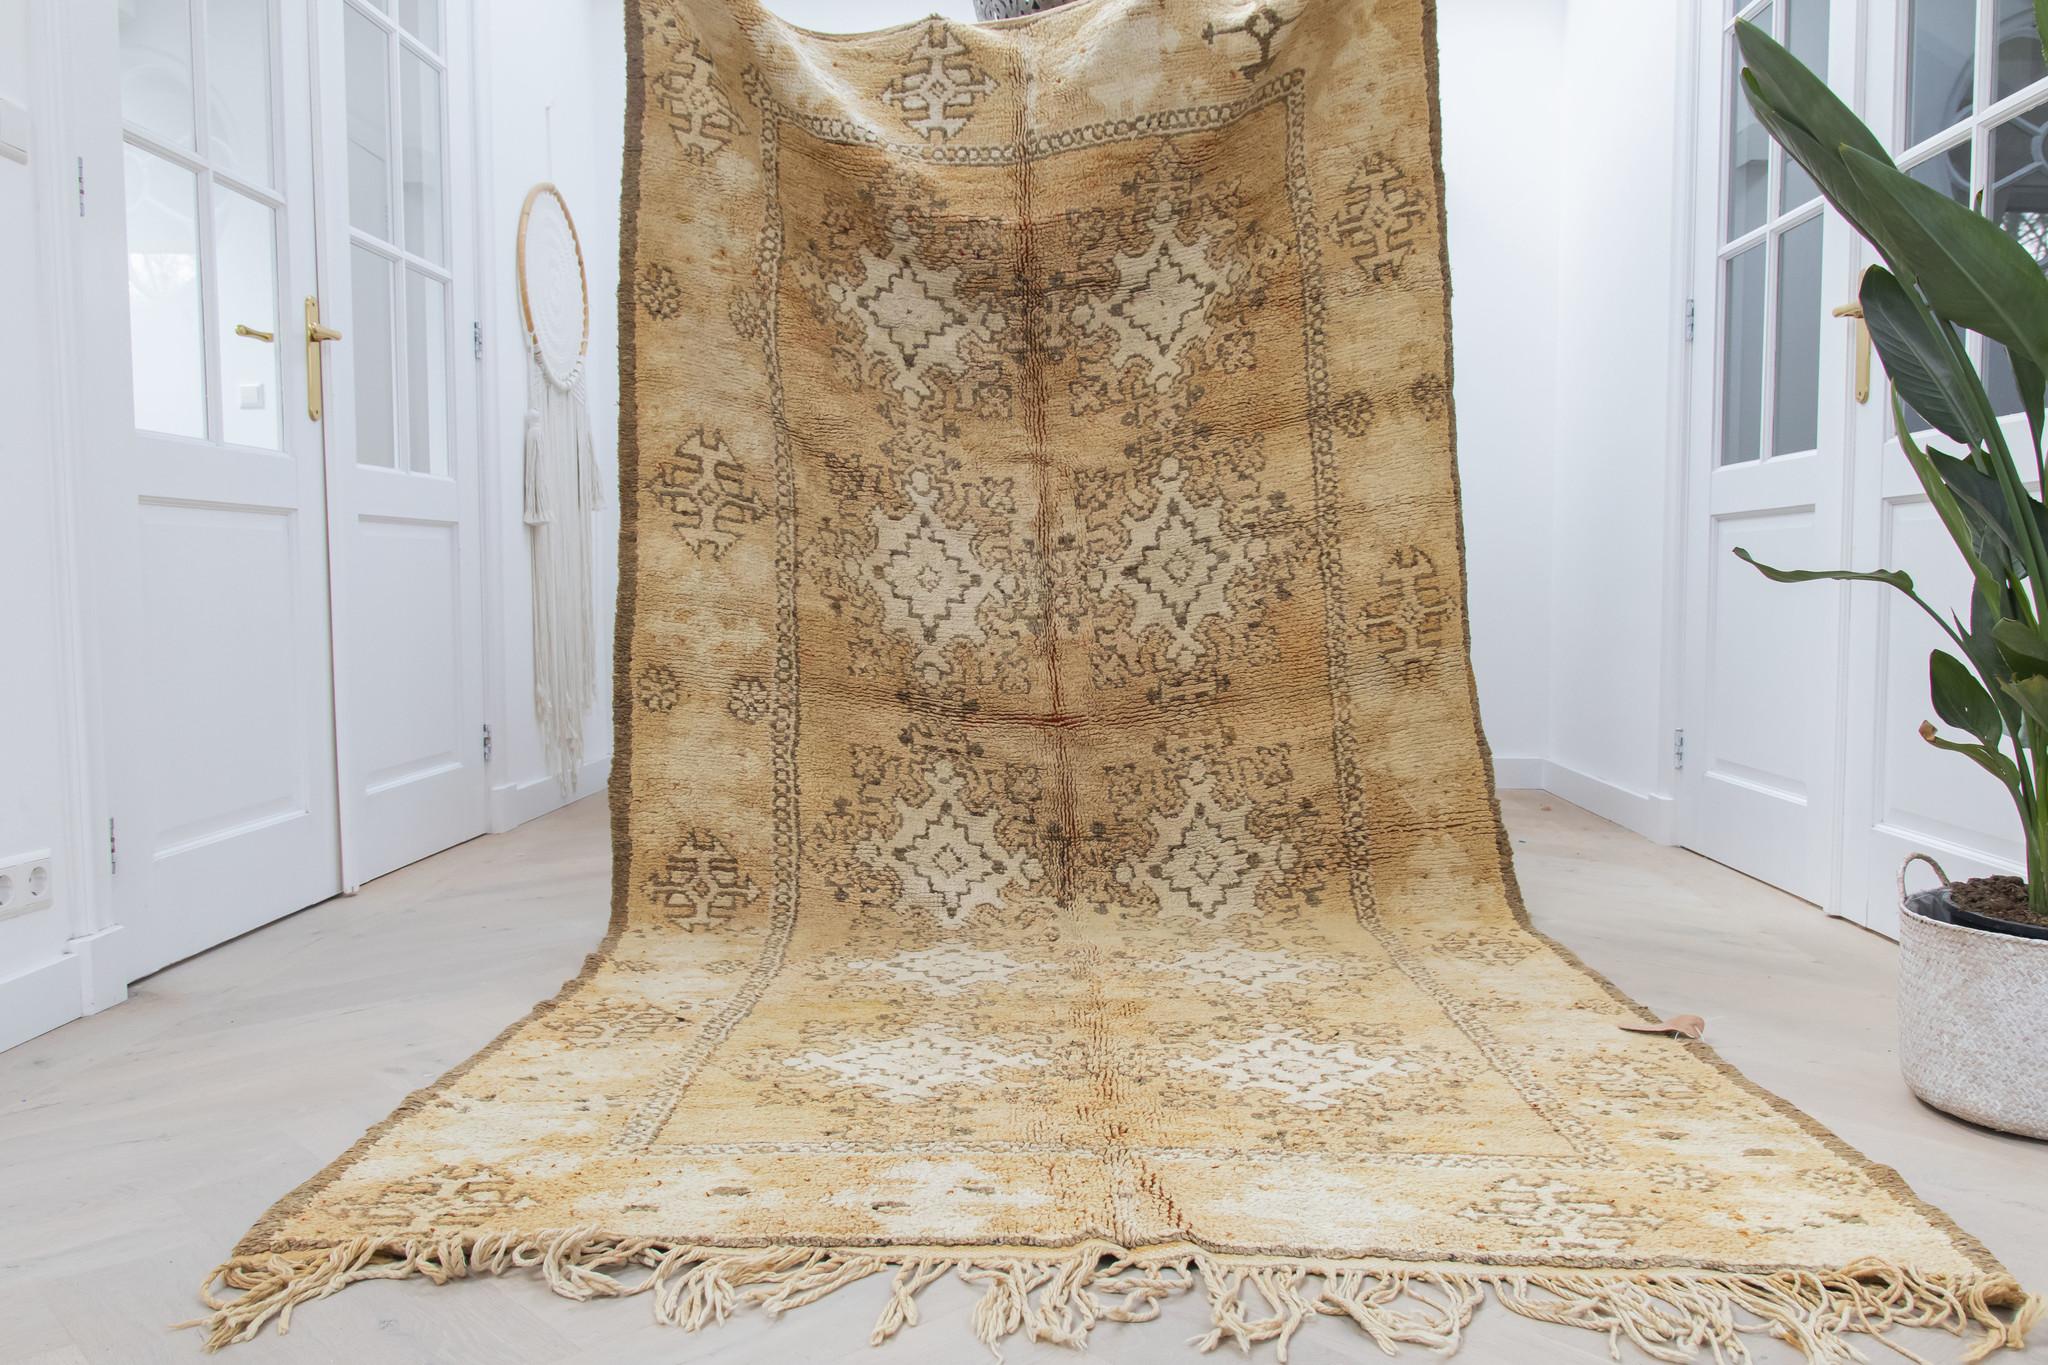 Simply Pure Handgefertigter Vintage Boujaad Teppich aus Marokko 158 x 310 cm